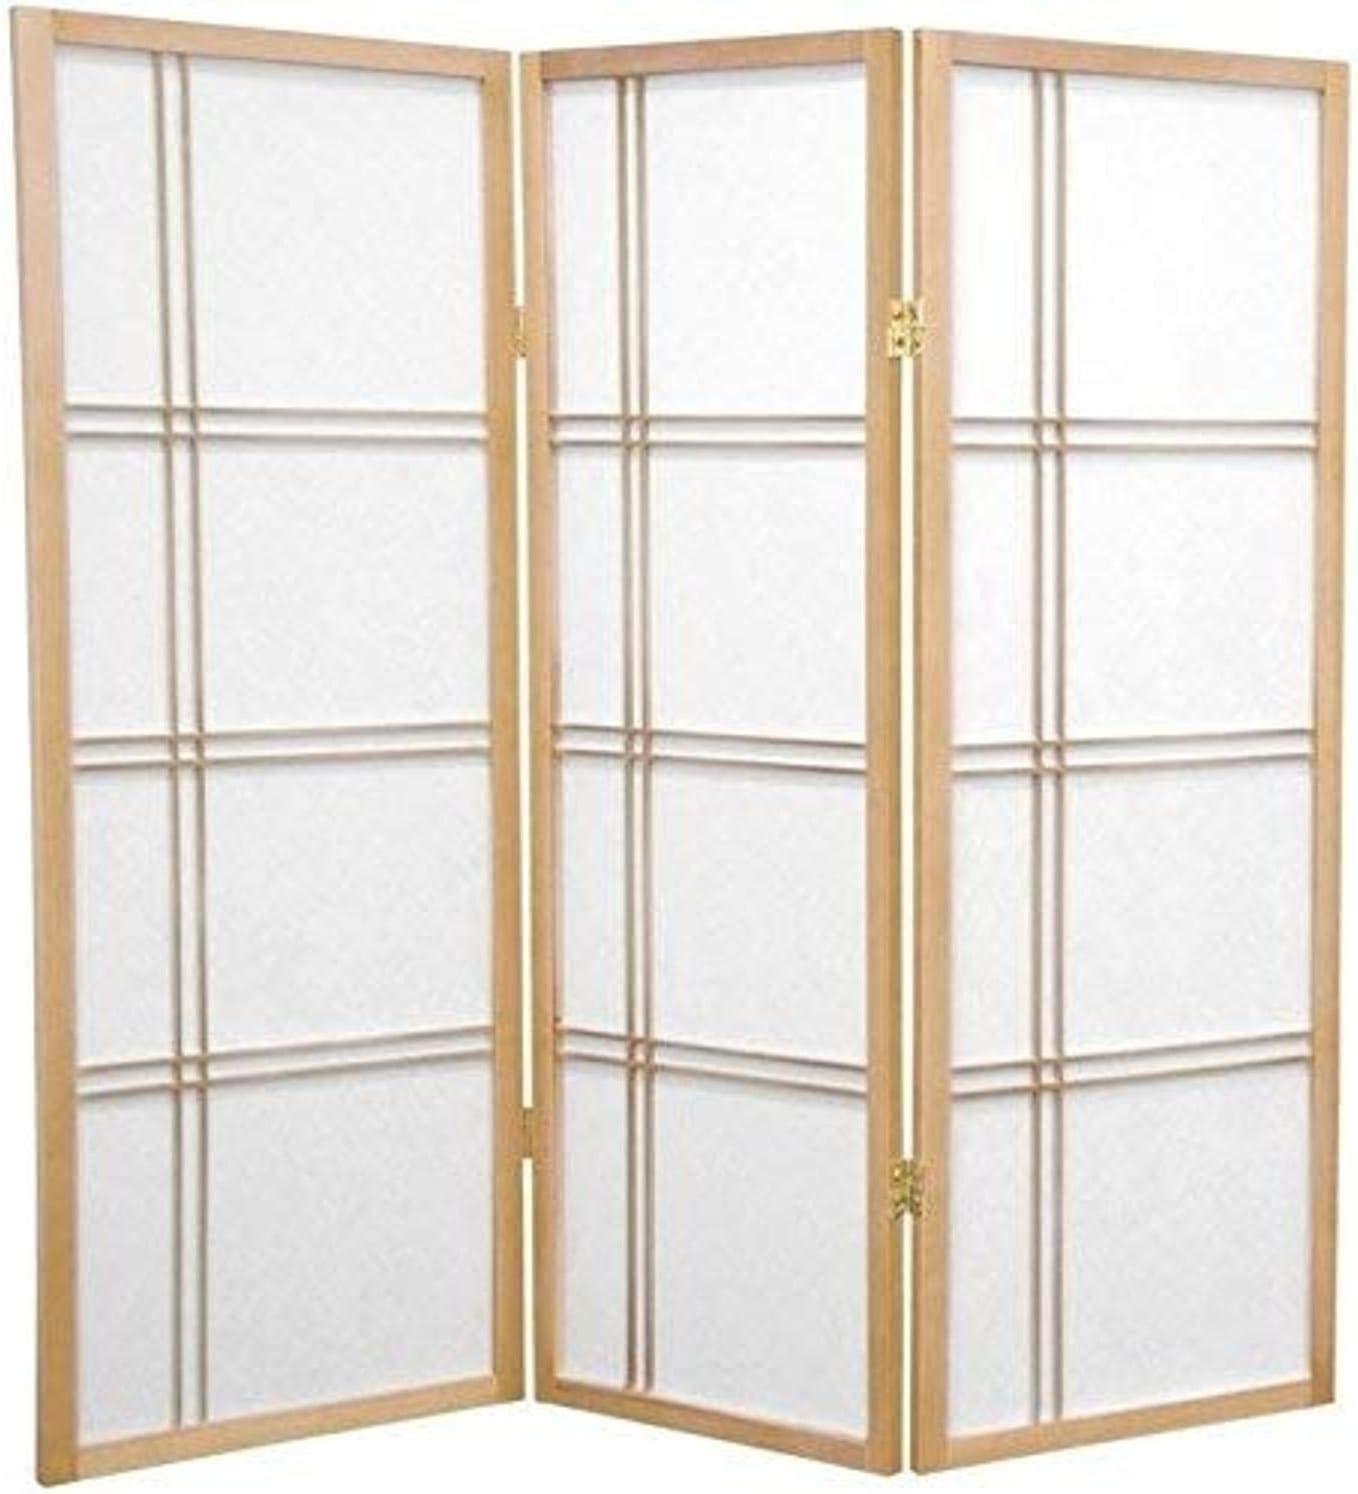 Oriental Furniture 4 ft. Tall Double Cross Shoji Screen - Natural - 3 Panels